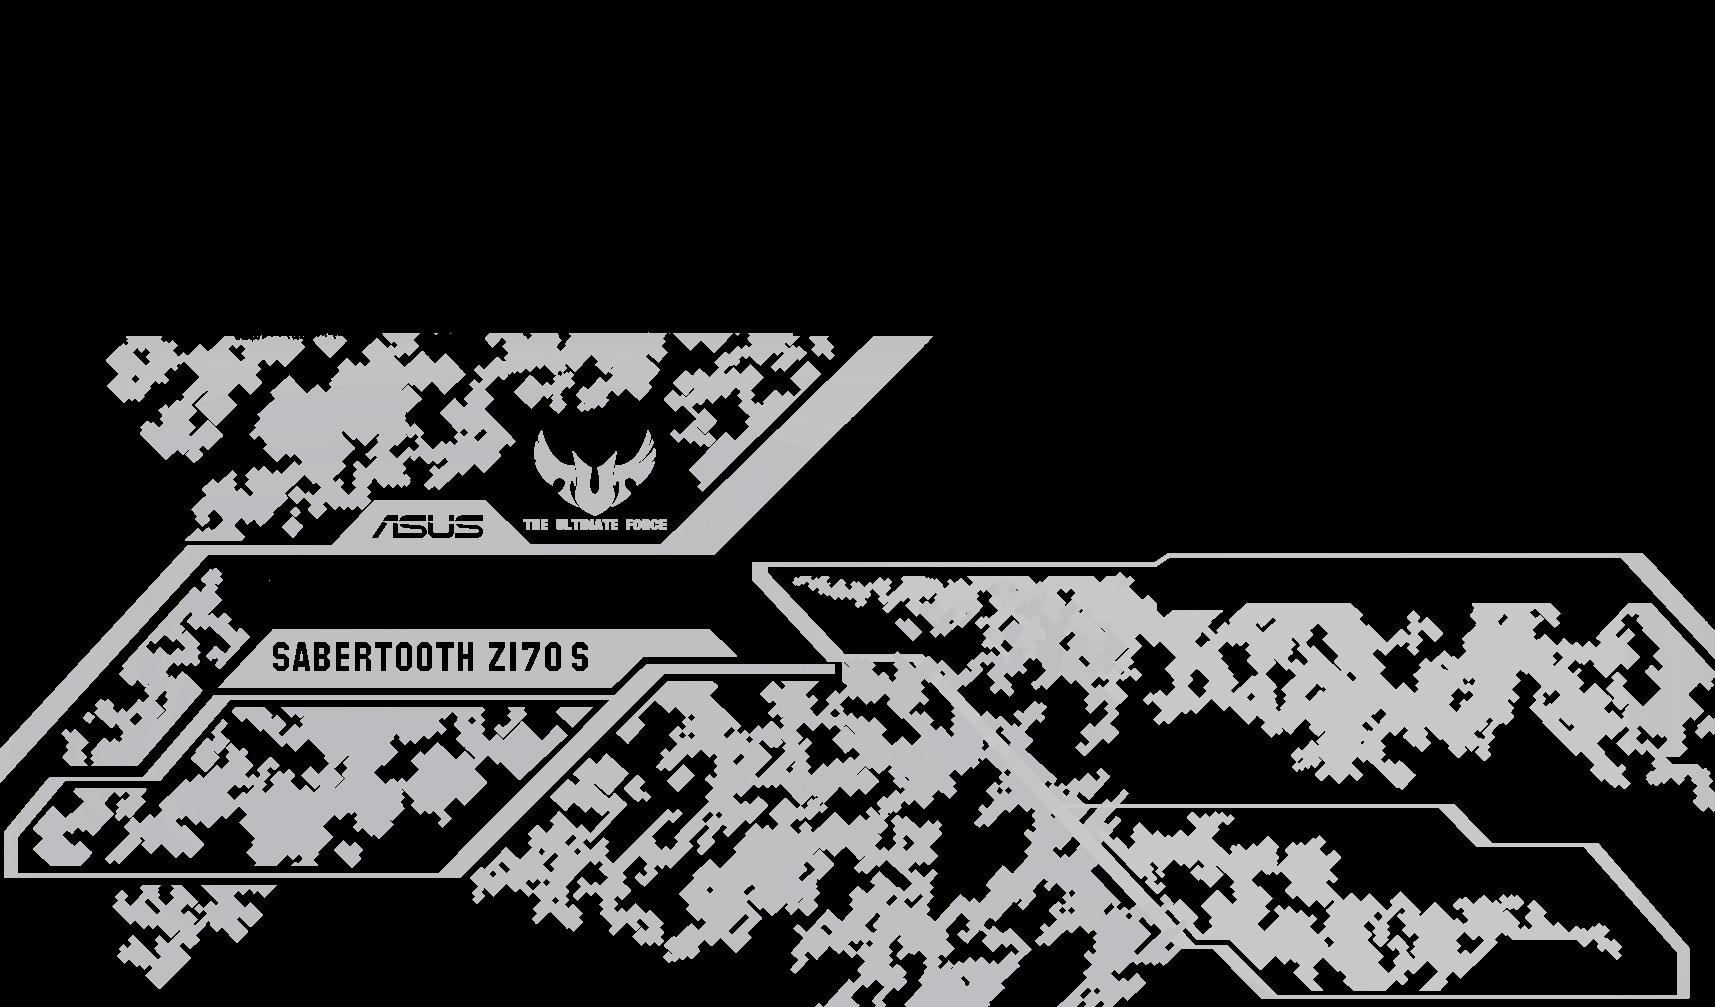 sabertooth z170 s